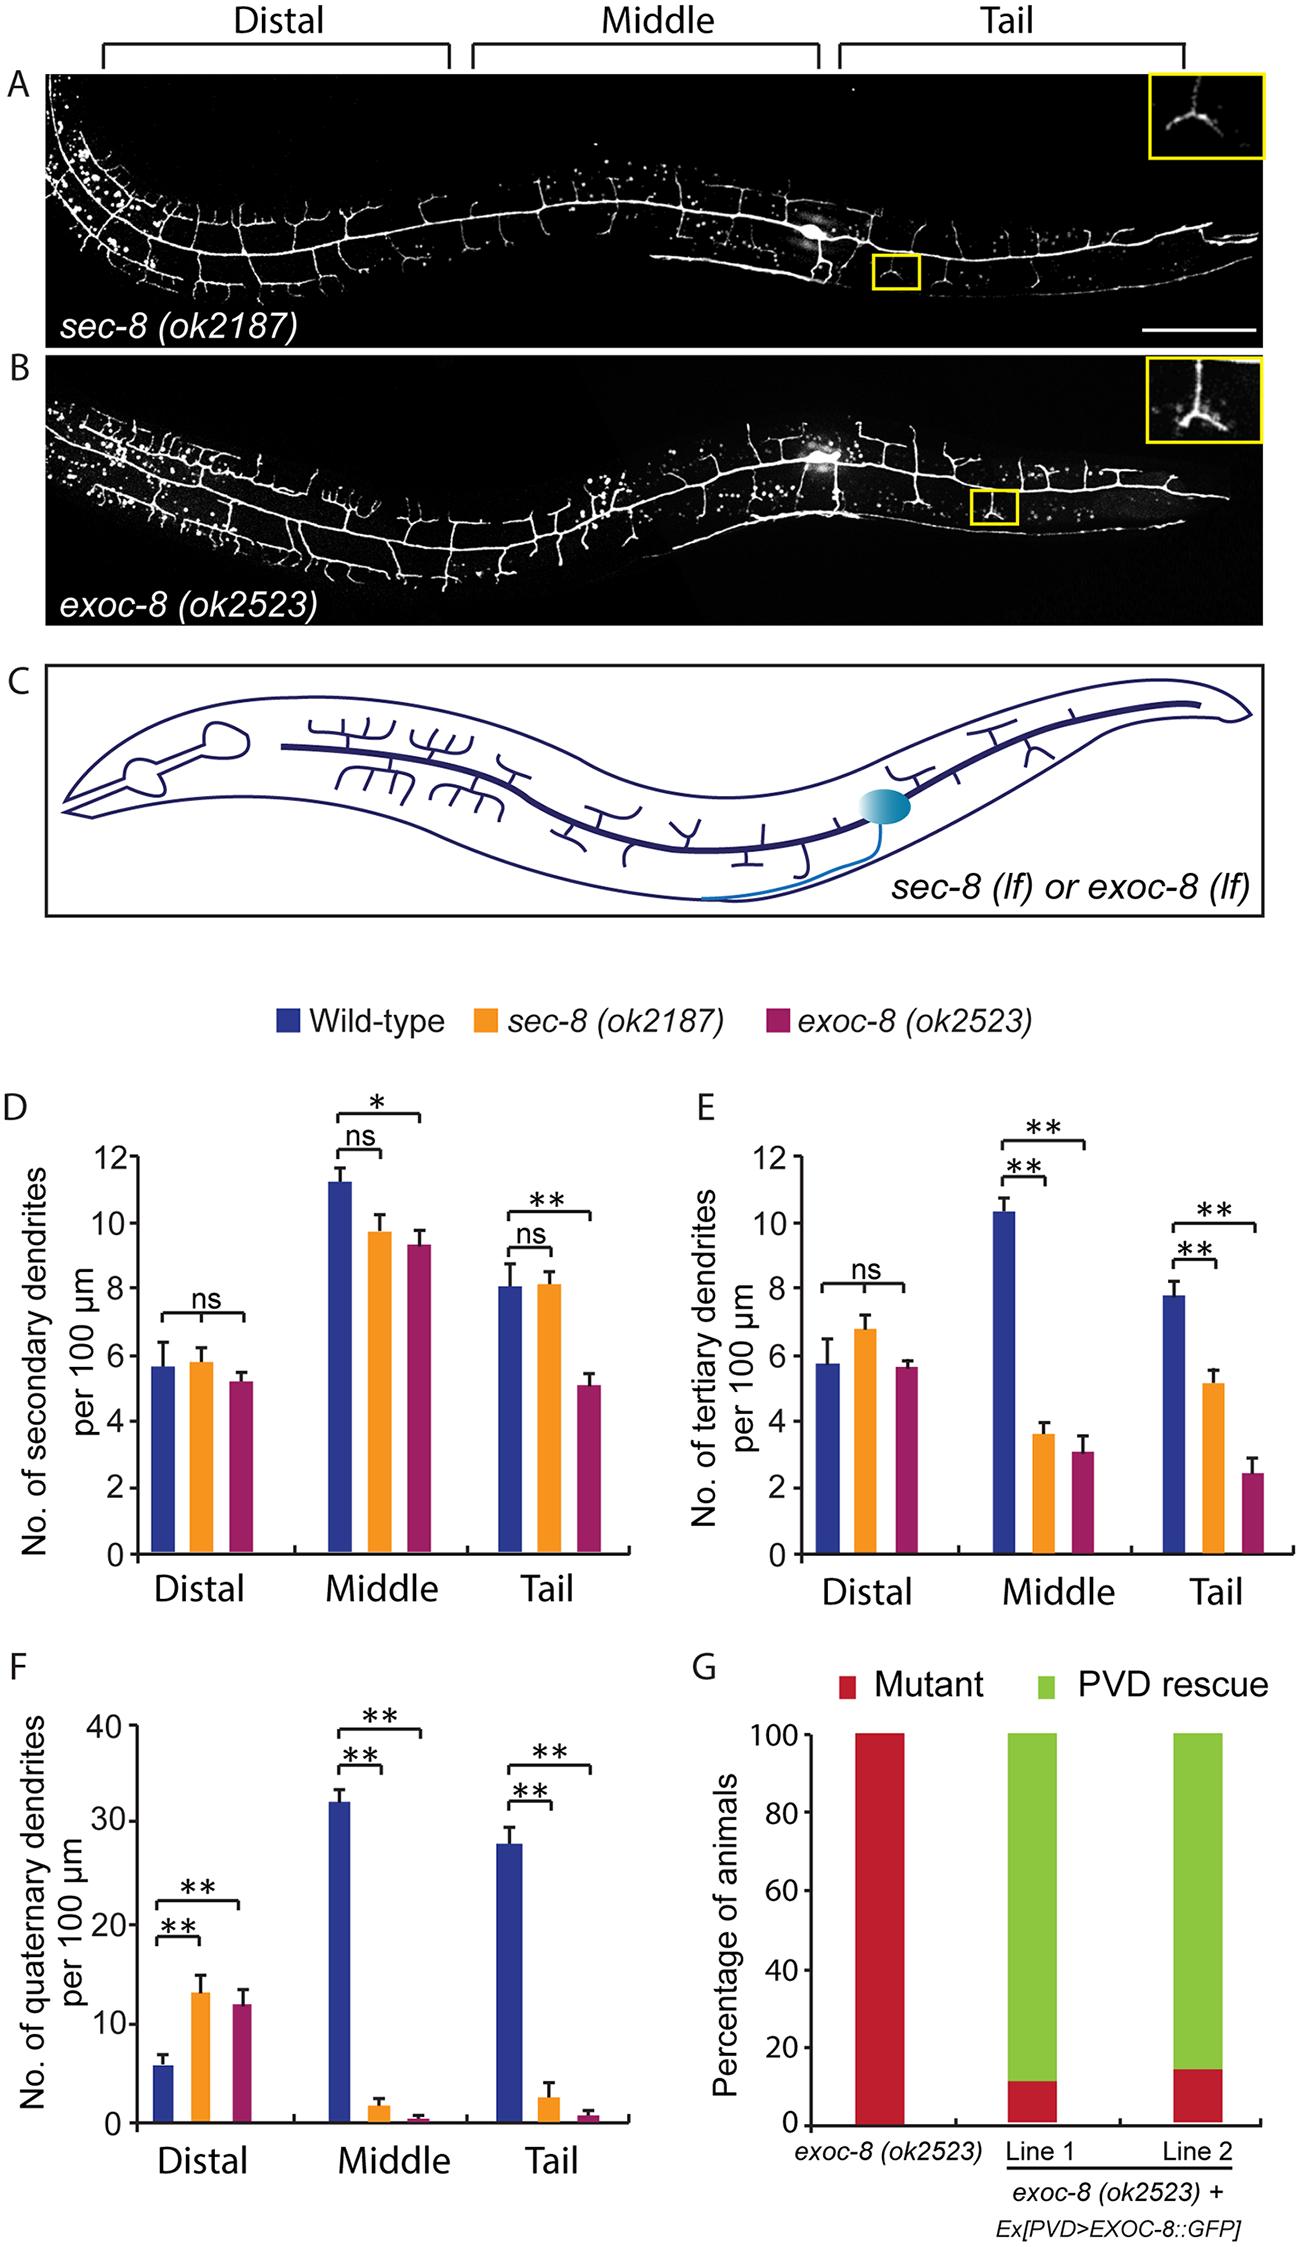 Mutations in <i>exoc-8</i> and <i>sec-8</i> reduce PVD dendritic arborization.